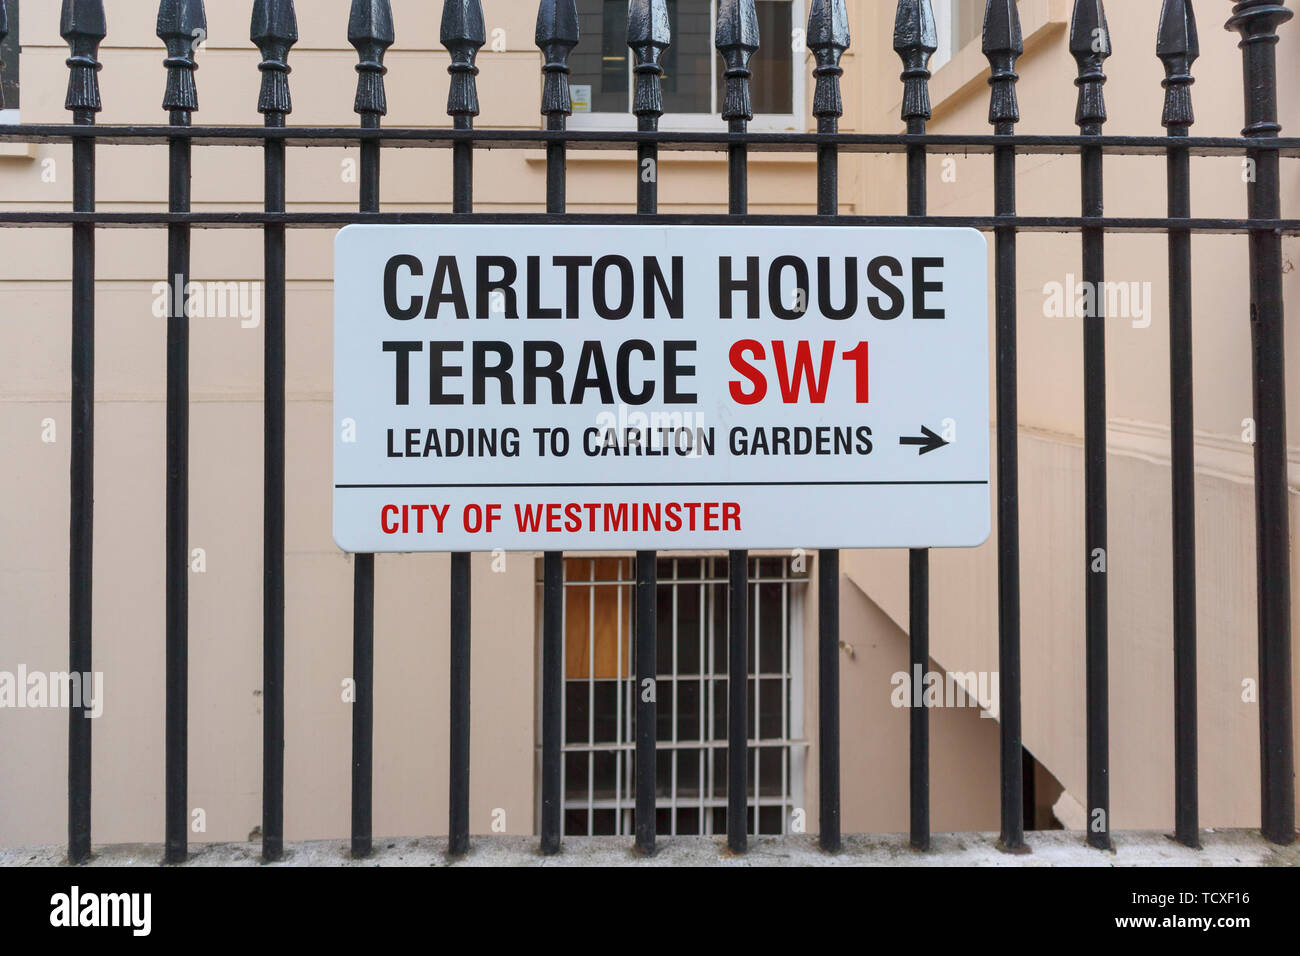 Roadside street name sign on iron railings for Carlton House Terrace, leading to Carlton Gardens, City of Westminster, London, SW1, UK - Stock Image